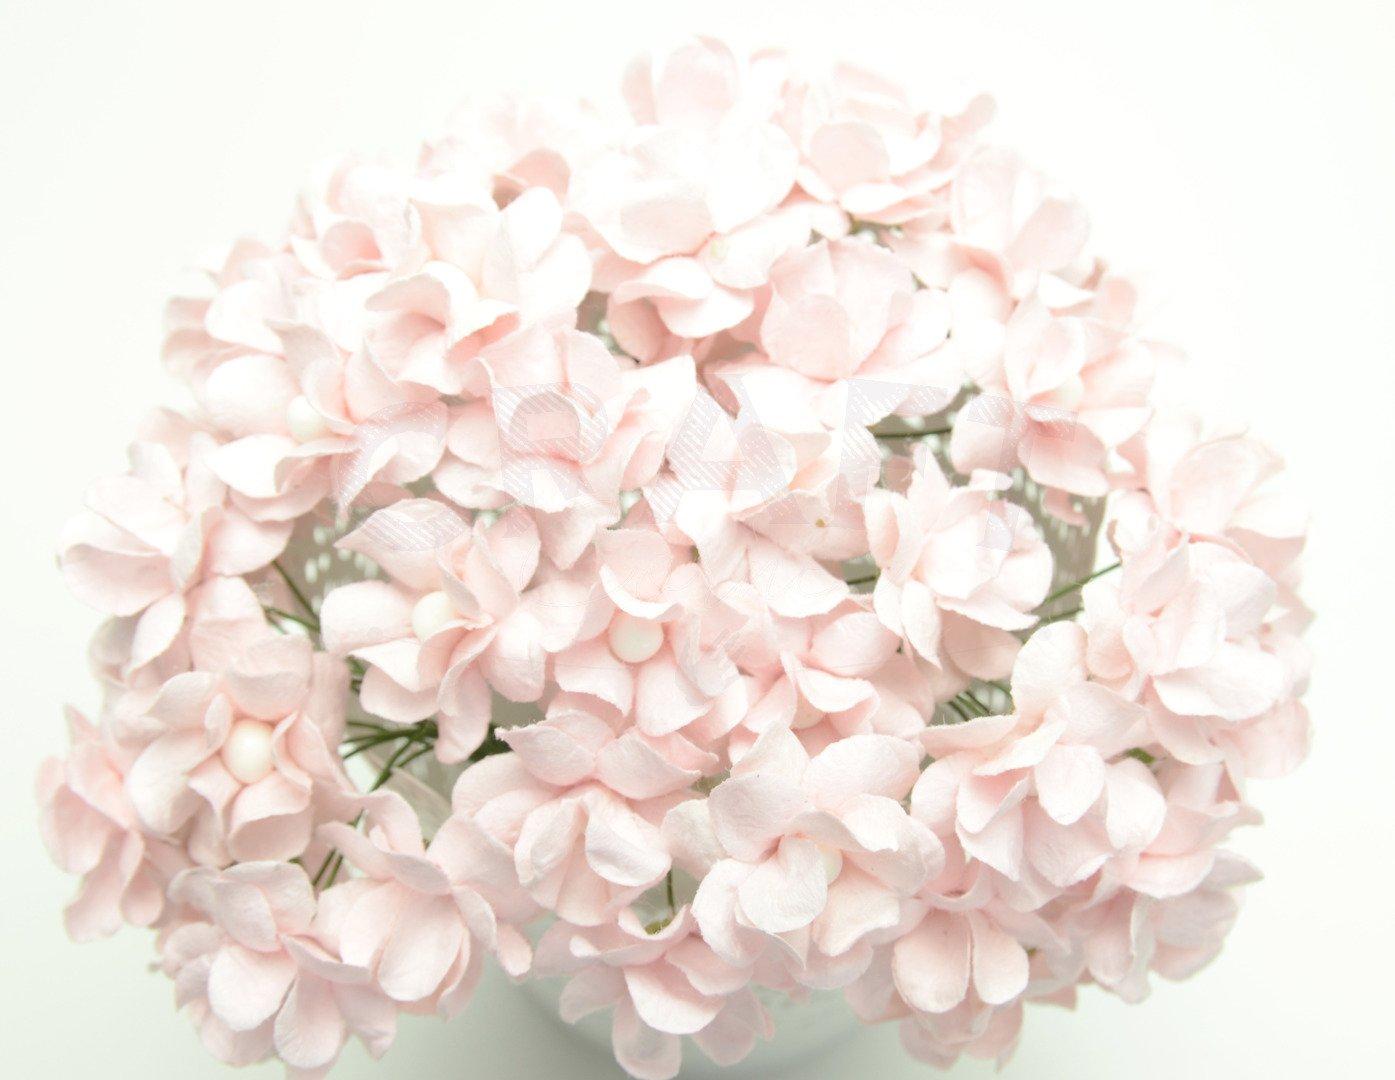 Filipinki Pale Pink Flowers 50pcs Kategorie Tematyczne Komunia